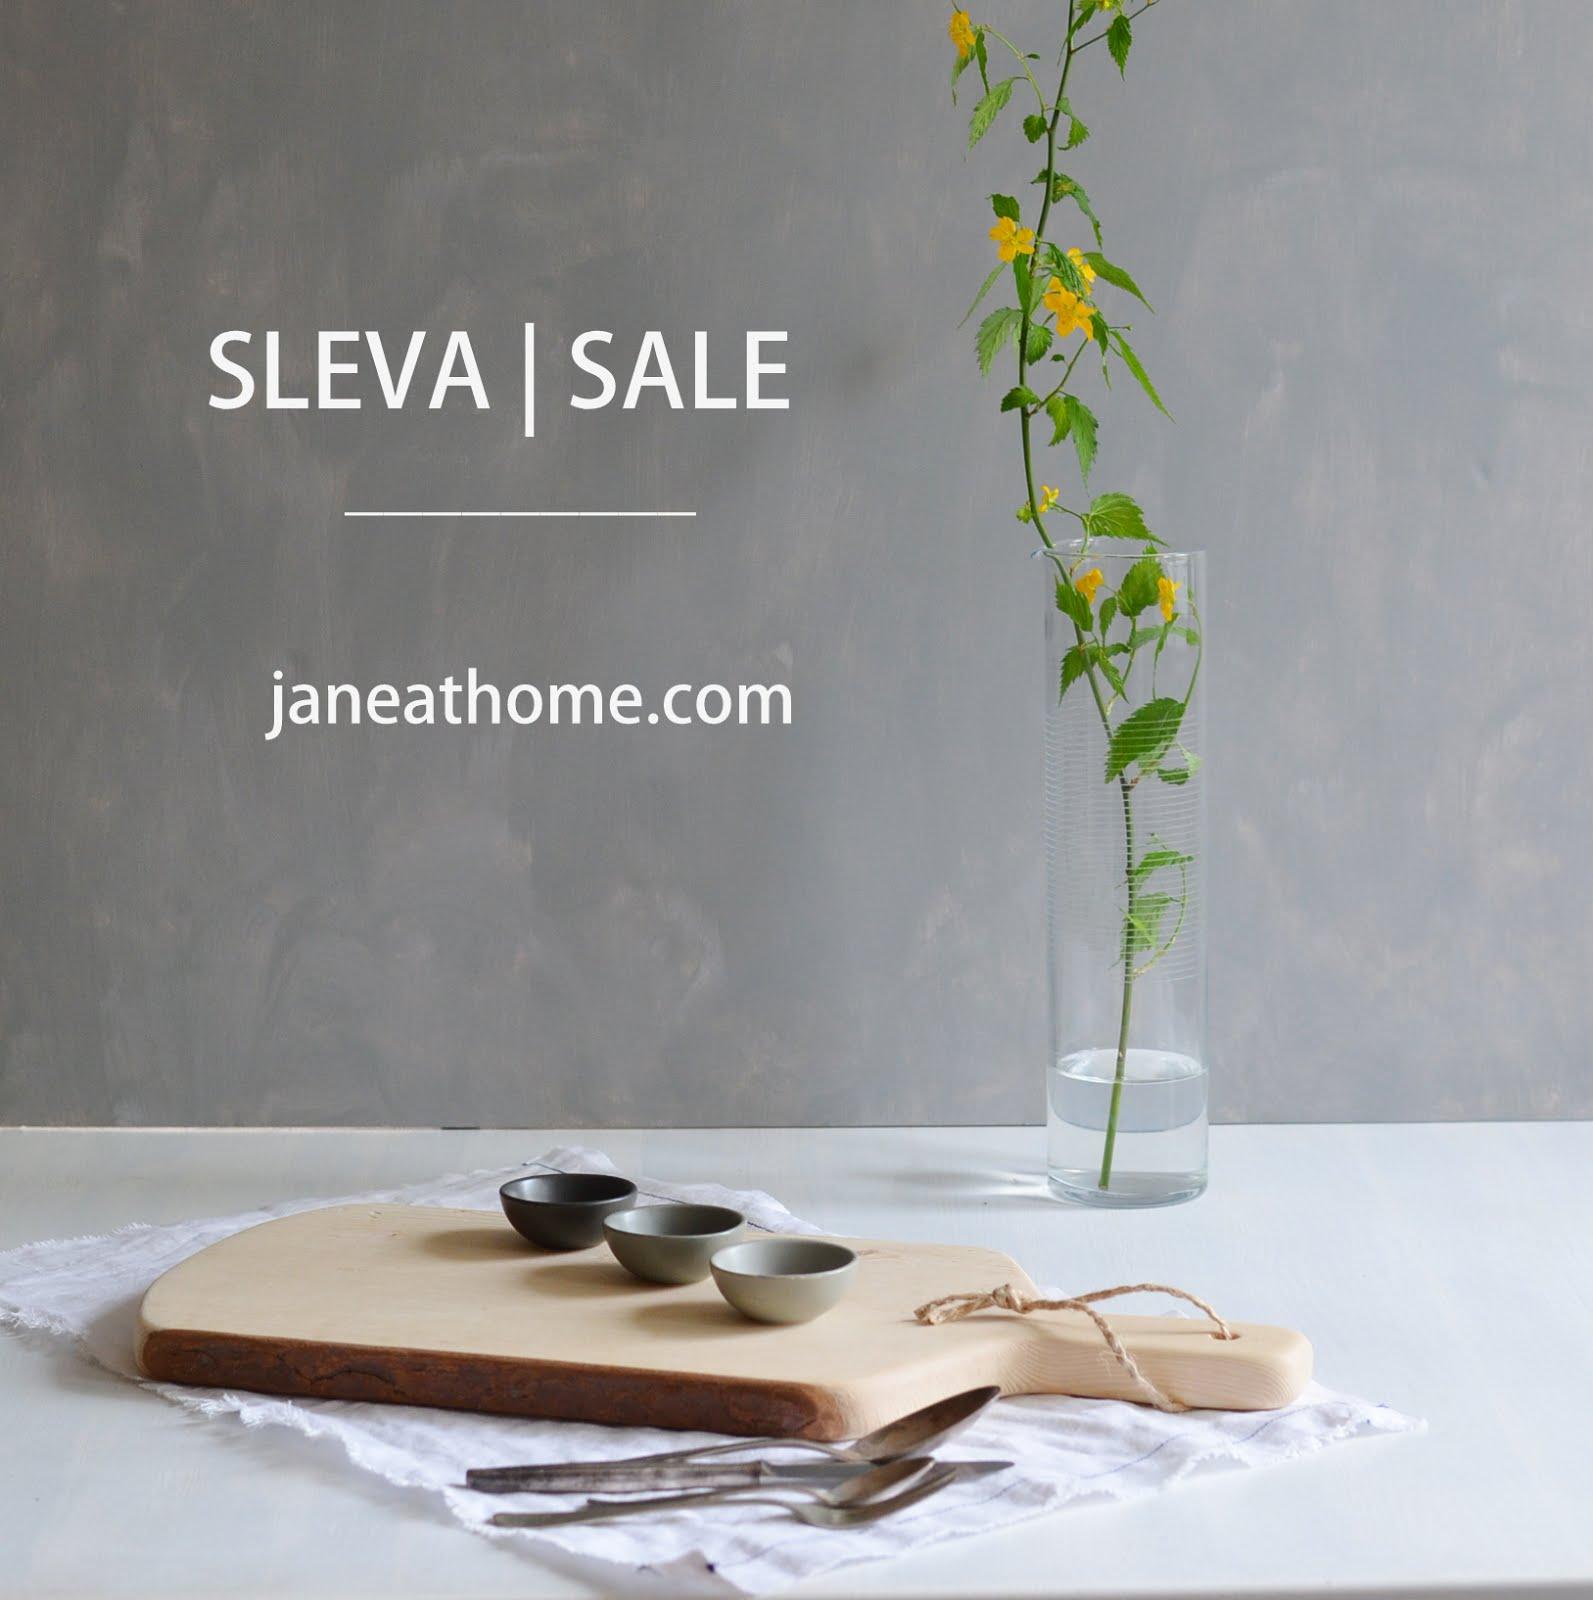 SLEVA | SALE